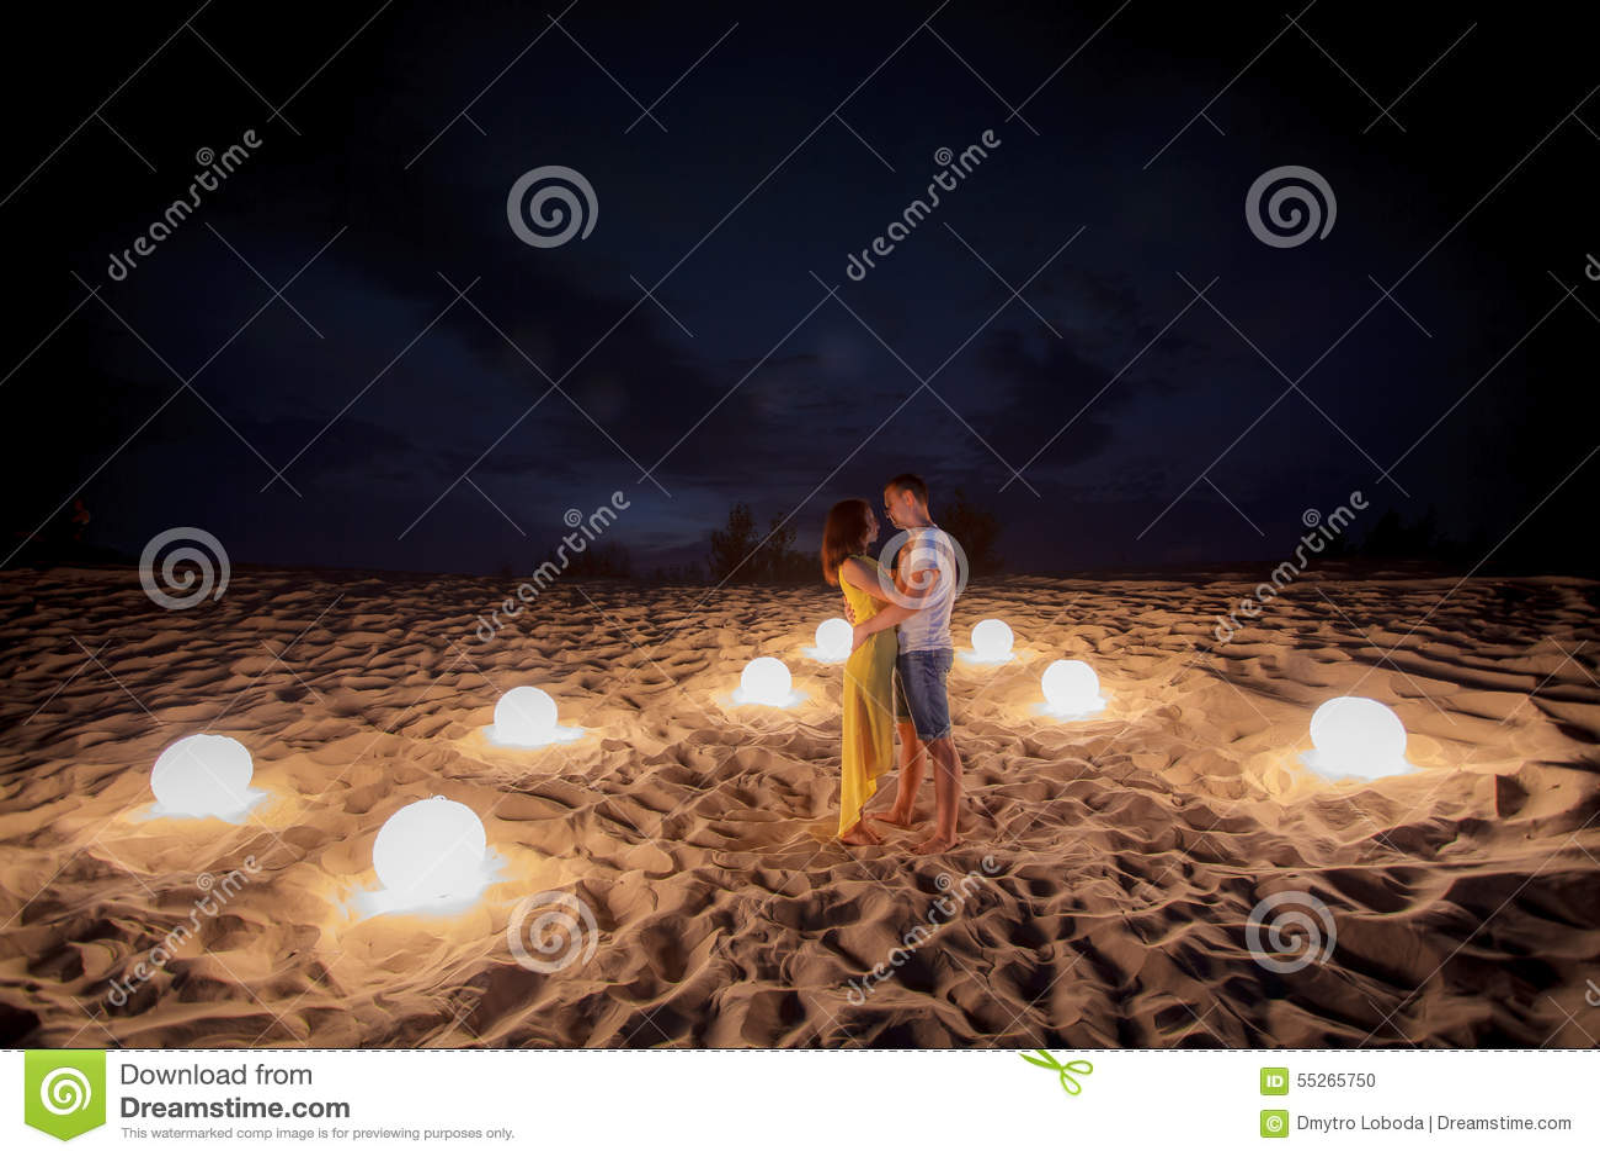 Beach, Couple, Romantic, Candles Stock Photo